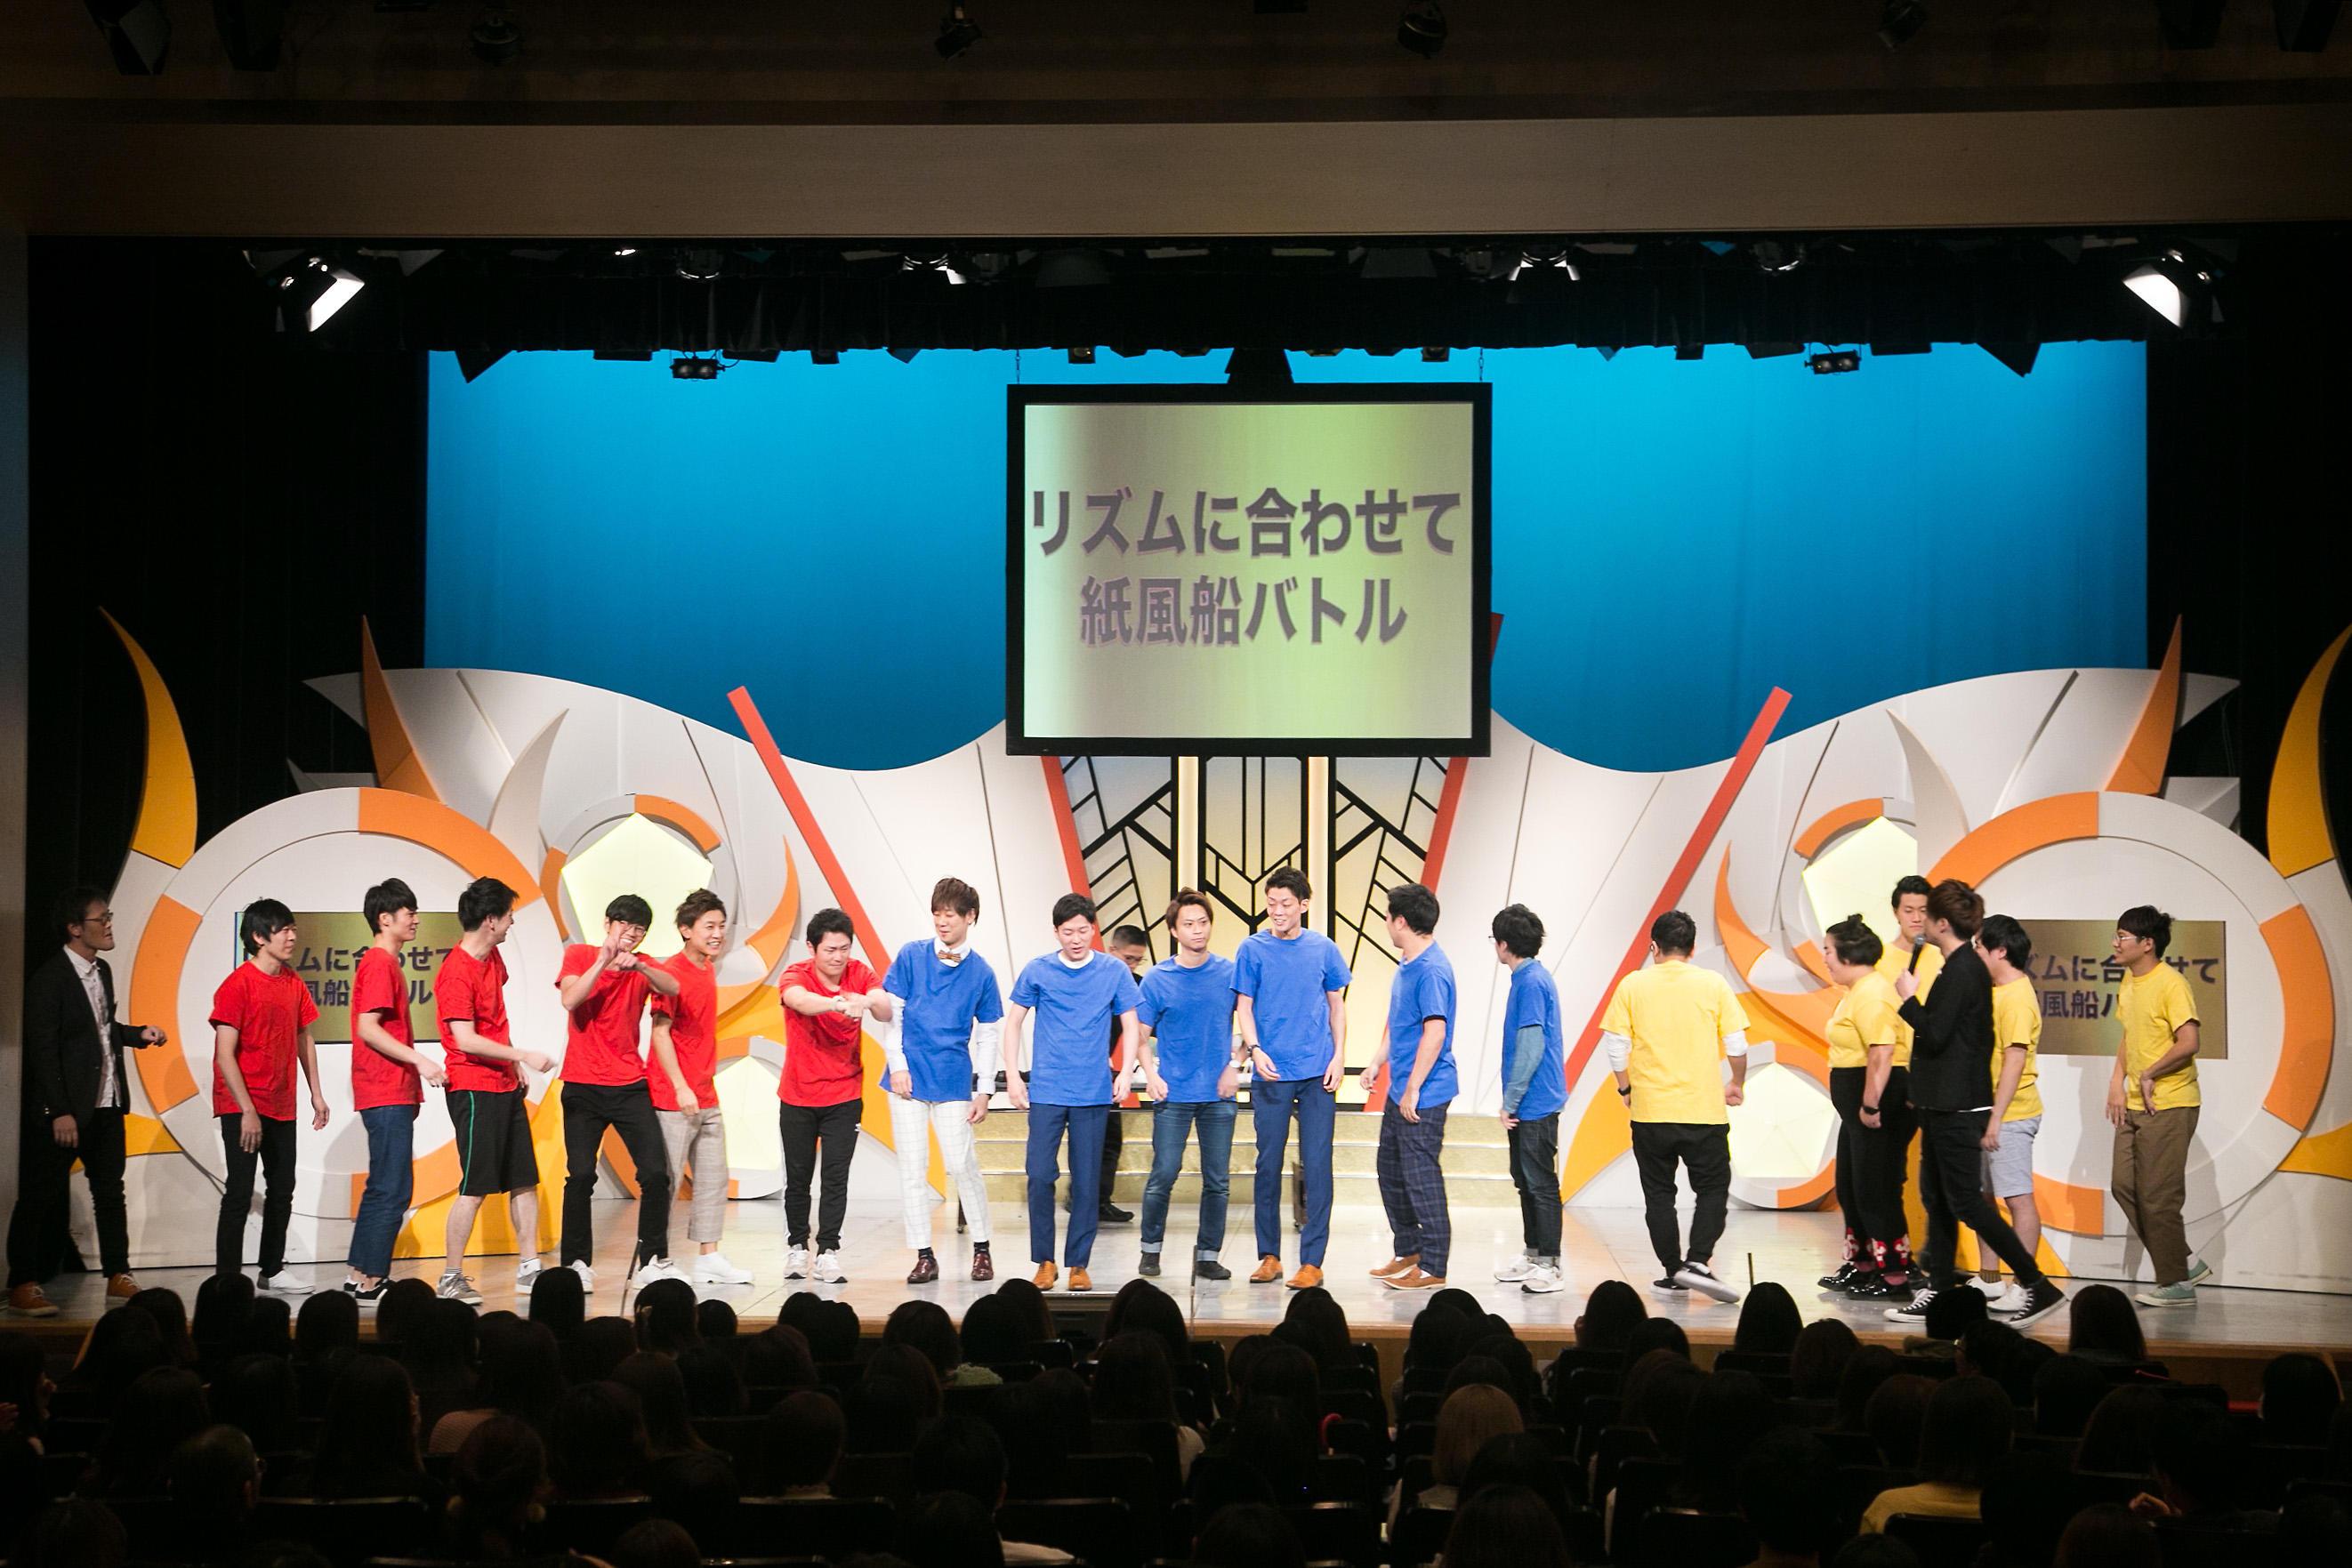 http://news.yoshimoto.co.jp/20171205222010-89aad34764dce64b7403c5495d65d5b718515982.jpg